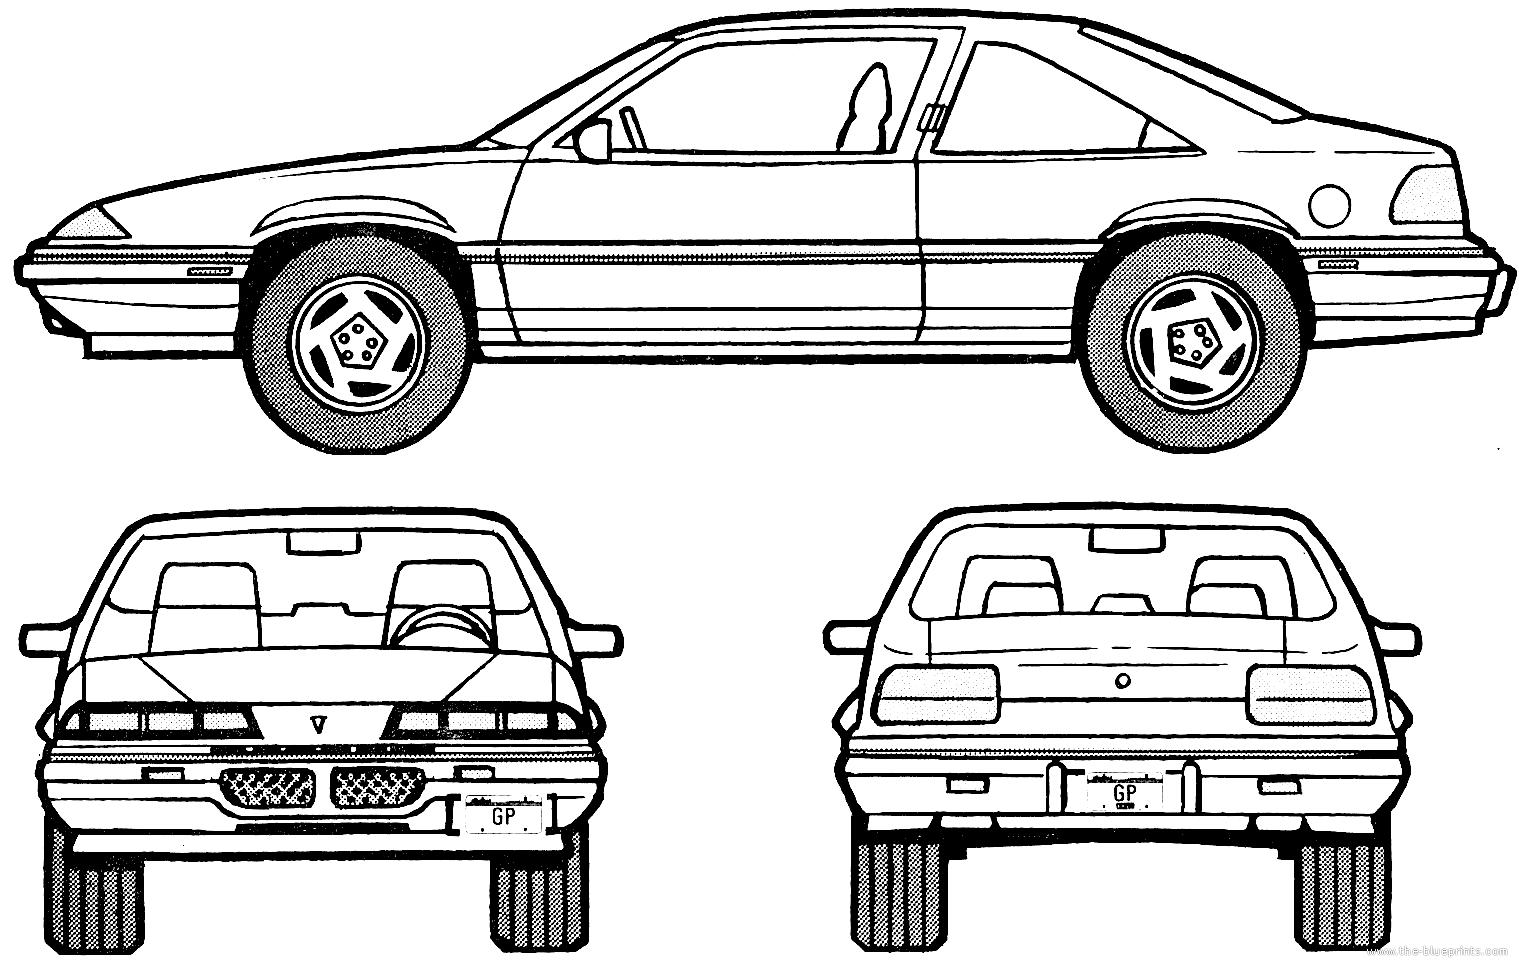 blueprints  u0026gt  cars  u0026gt  pontiac  u0026gt  pontiac grand prix se coupe